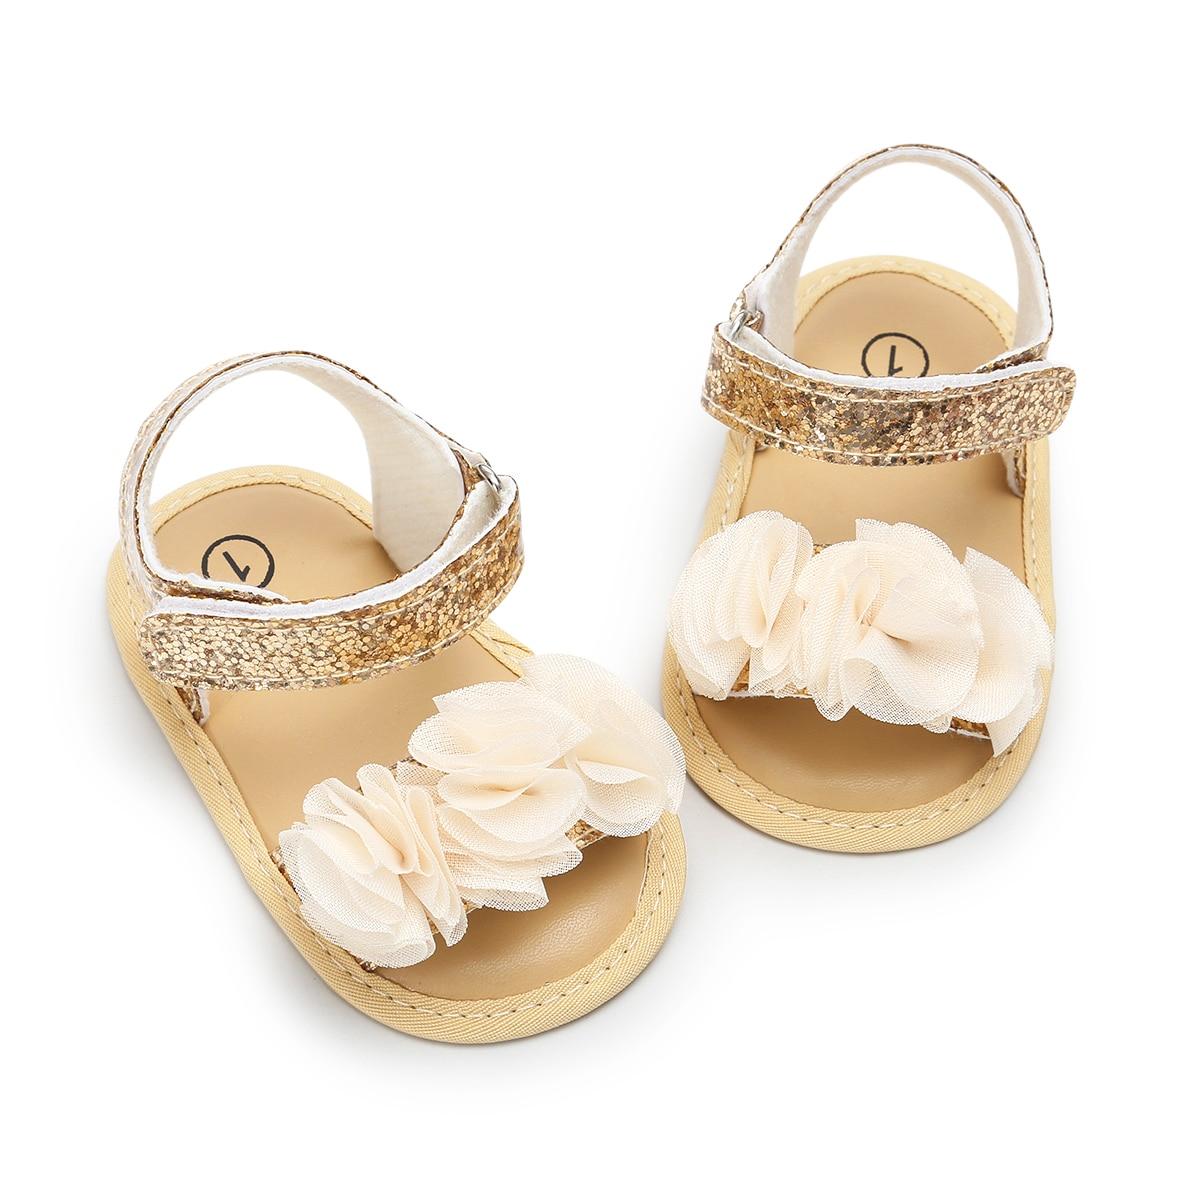 Girl Sandals Flowers Baby Girls Shoes Anti-slip Sandals Prewalkers Flower Walking Shoes Beach Sandals